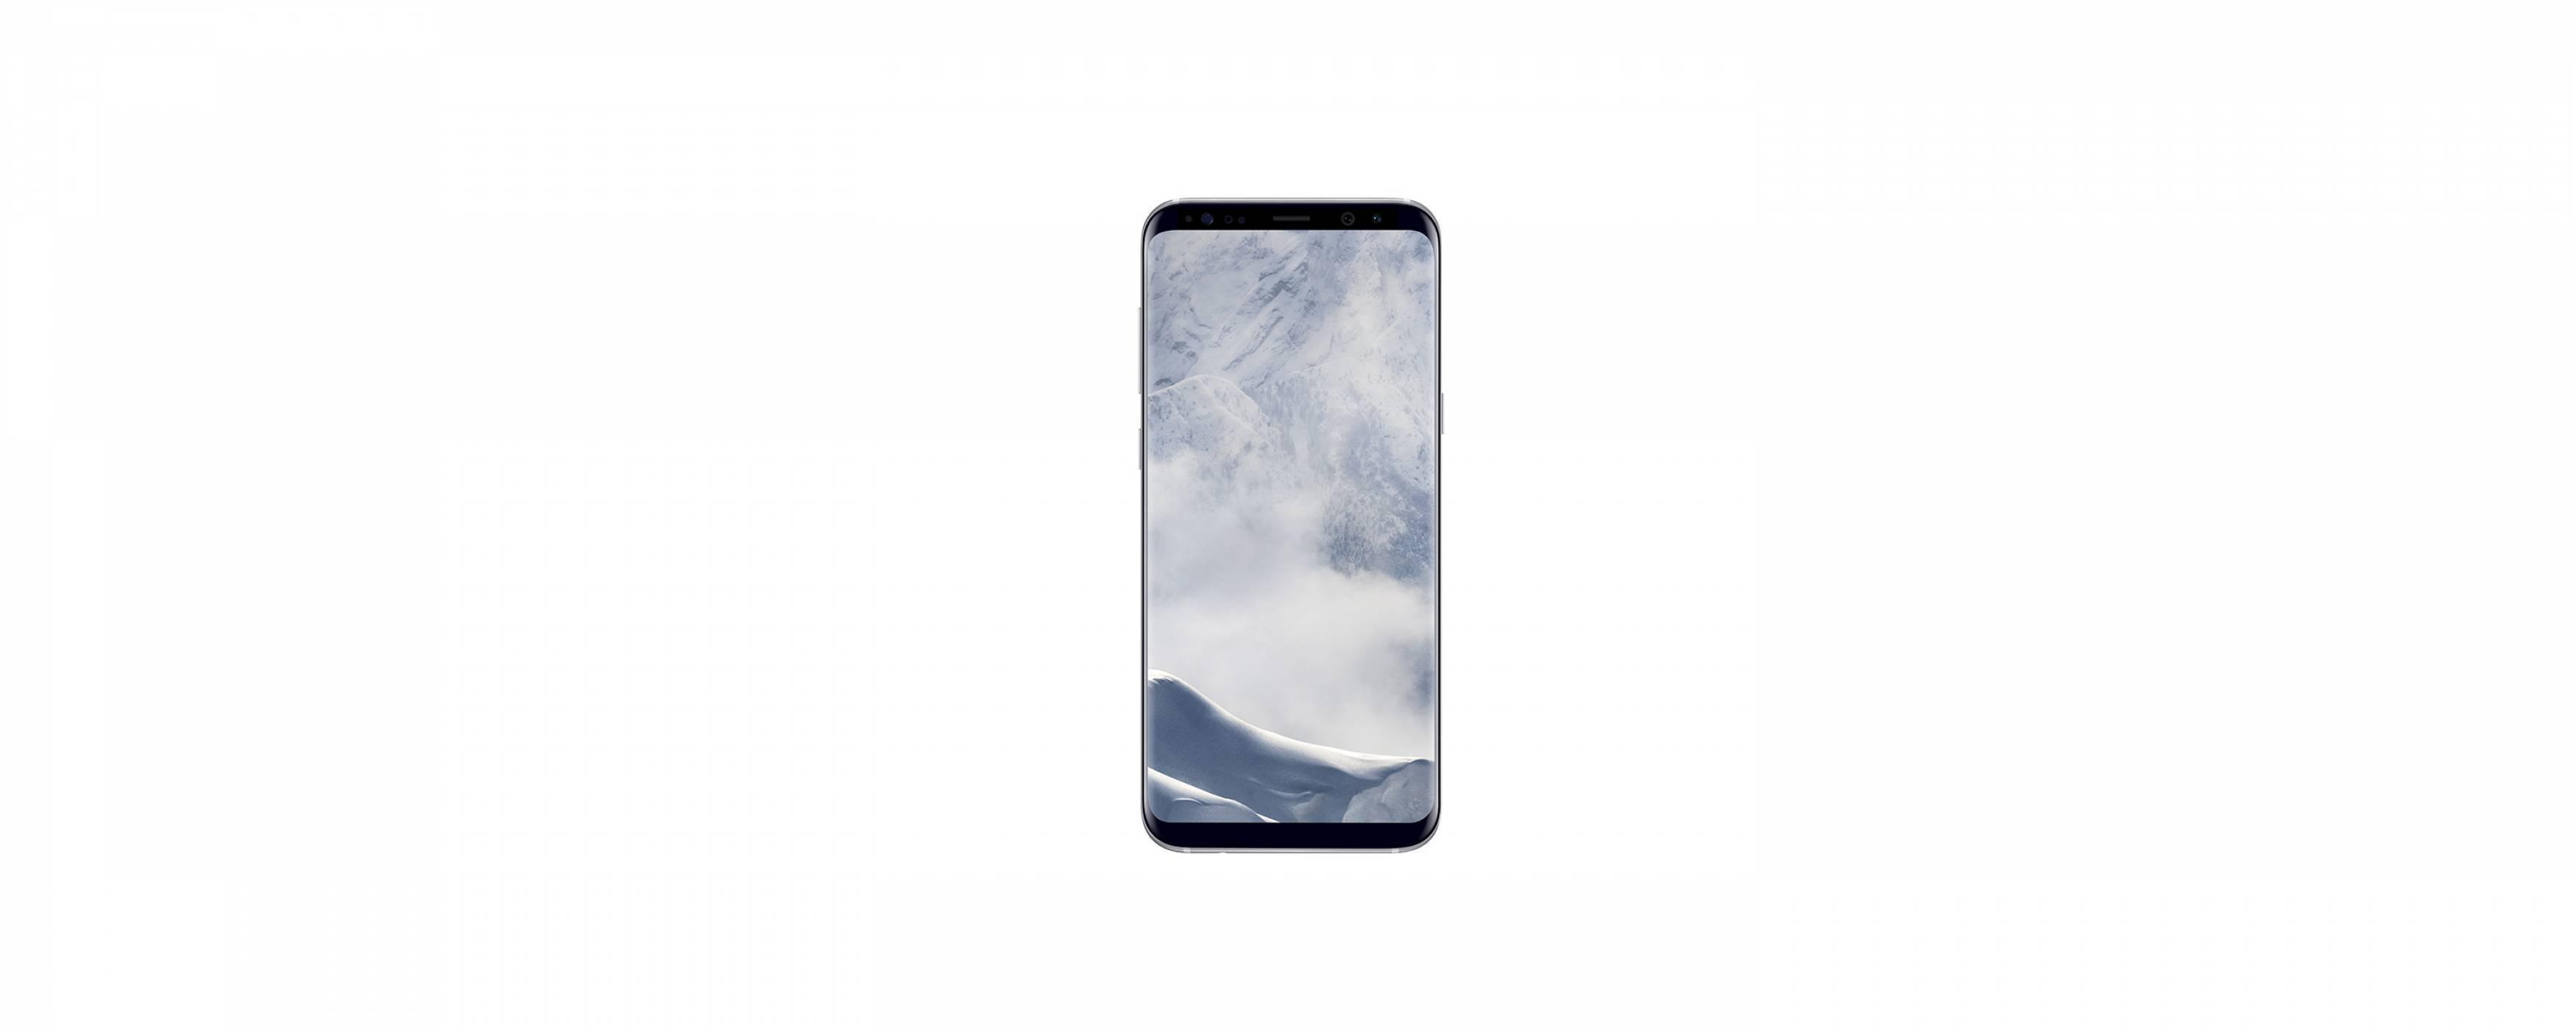 Samsung Galaxy S8+: този луд, луд дисплей, в който се влюбих (видео ревю)